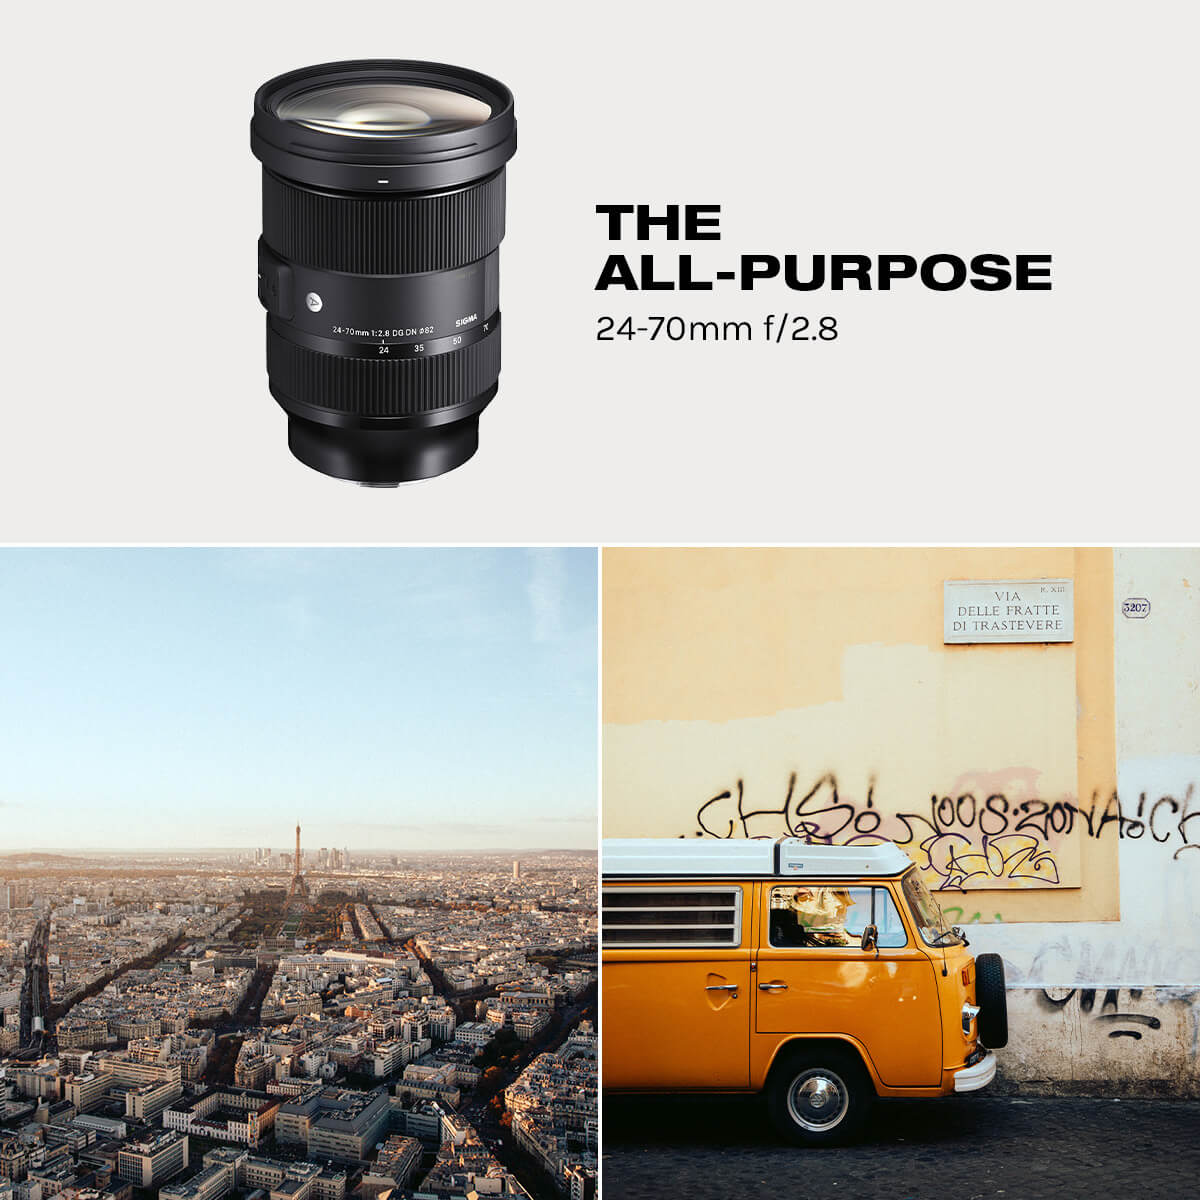 Best All-Purpose Lens for Travel